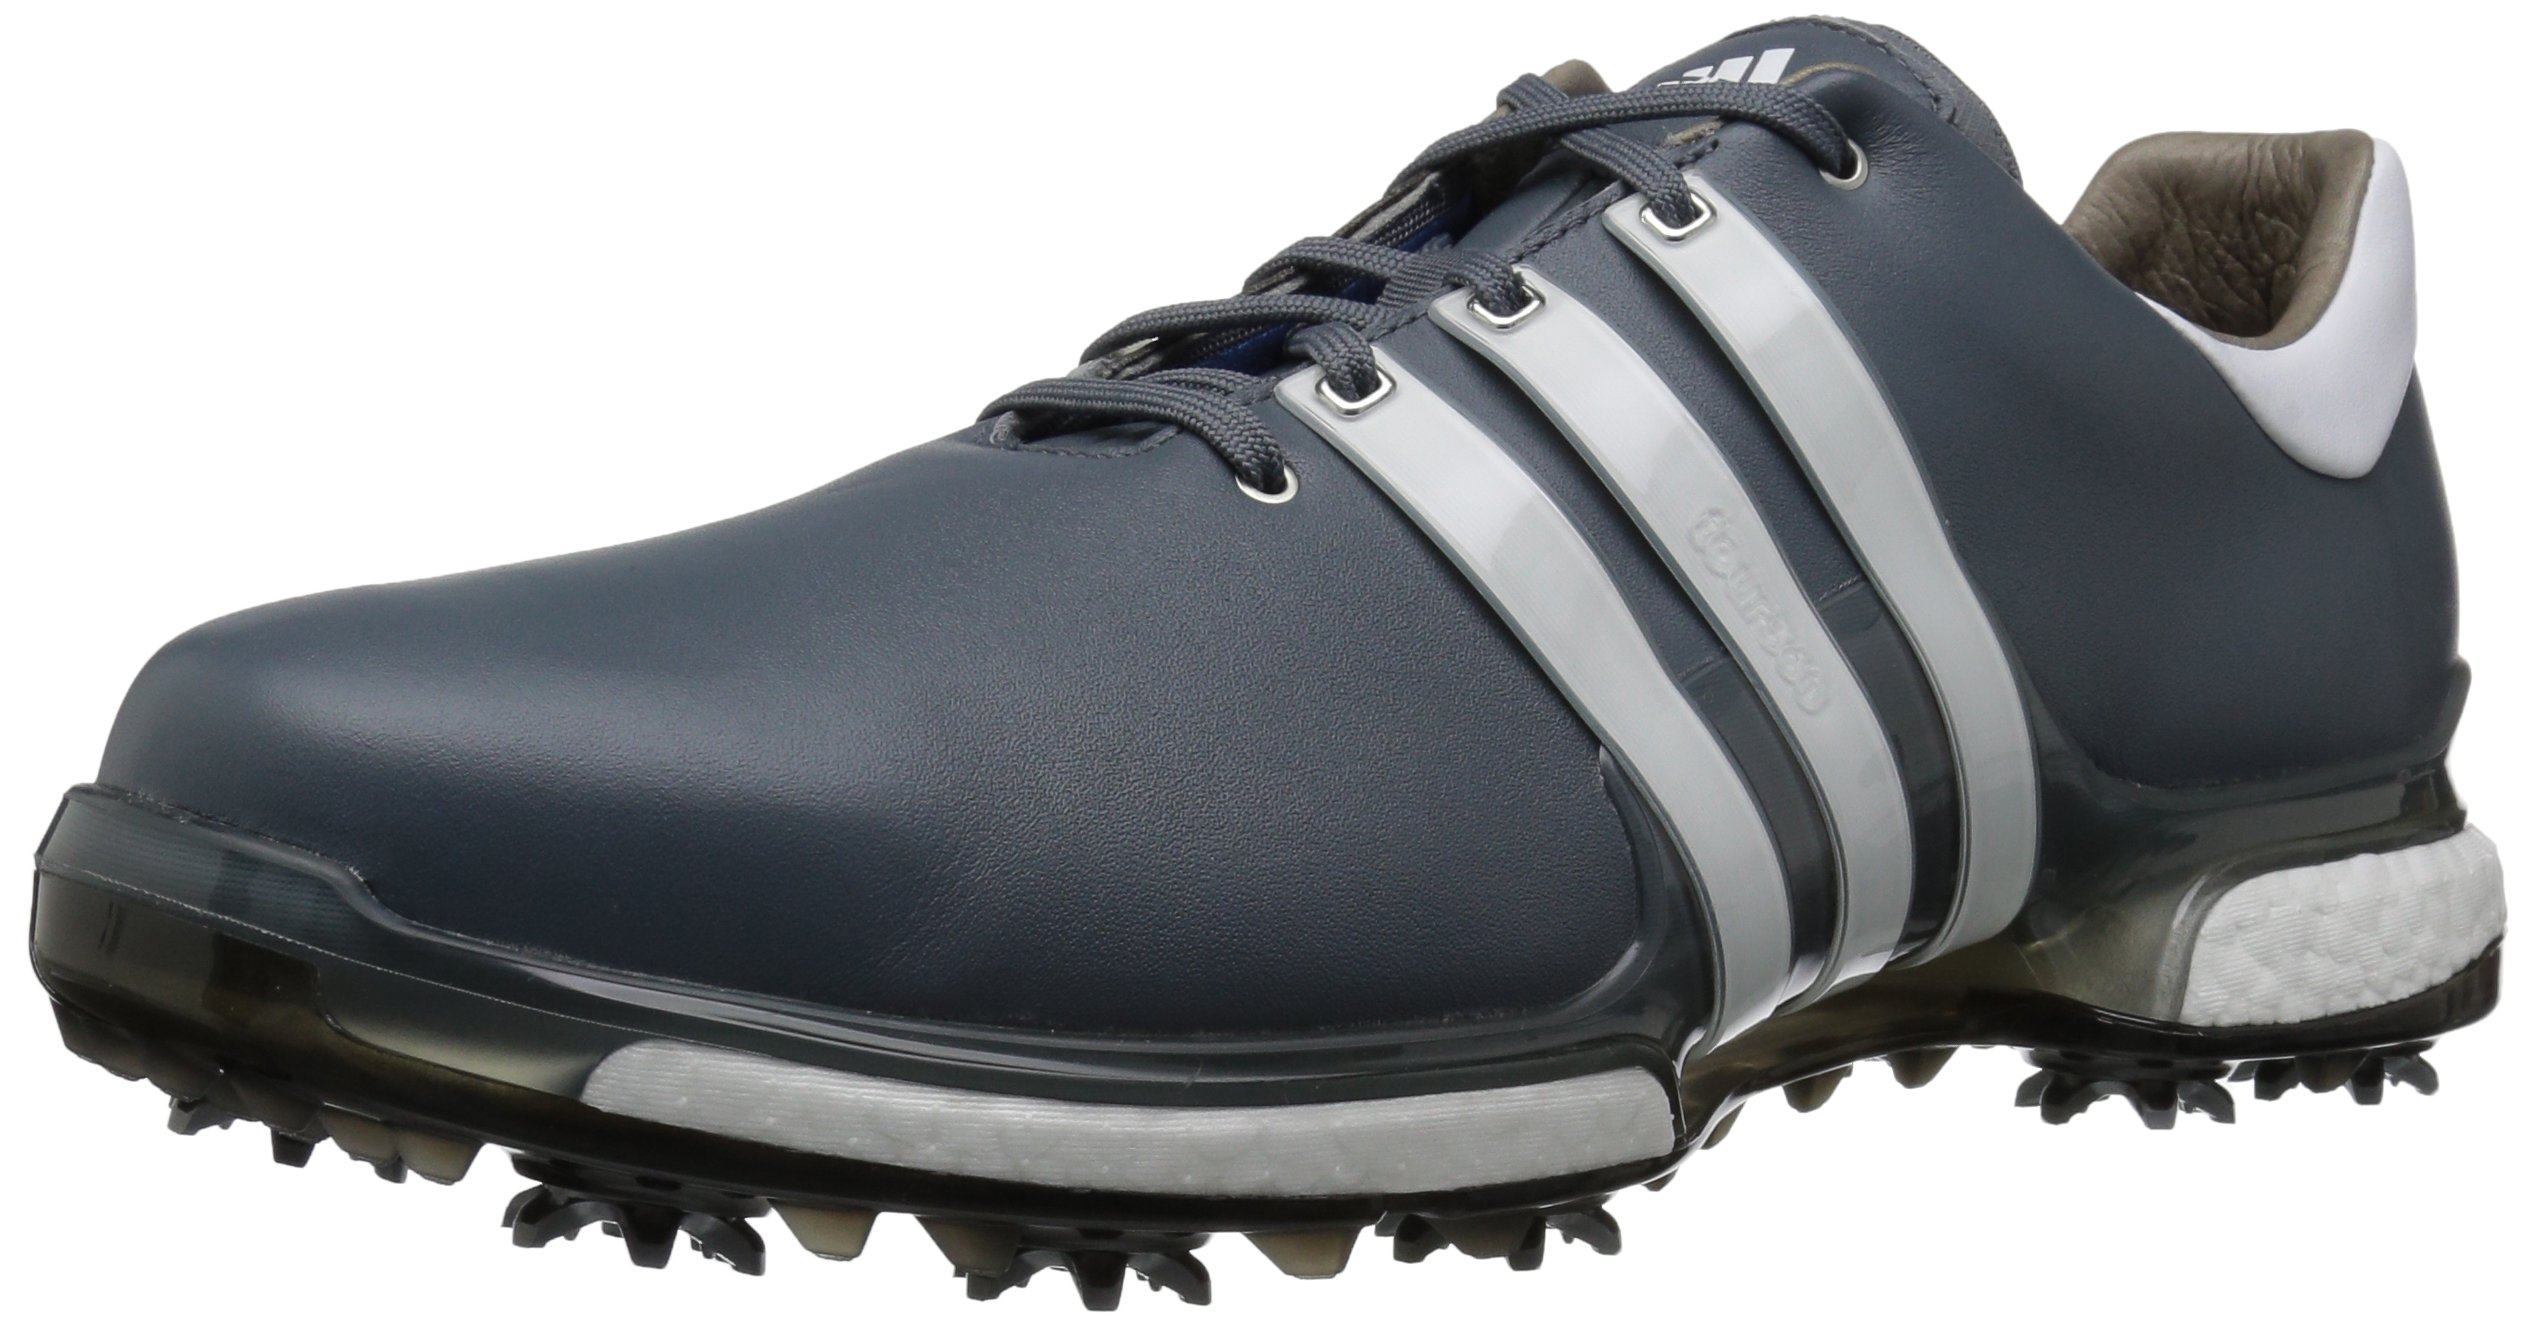 adidas Men's TOUR 360 2.0 Golf Shoe, Onix/White/Black, 7.5 M US